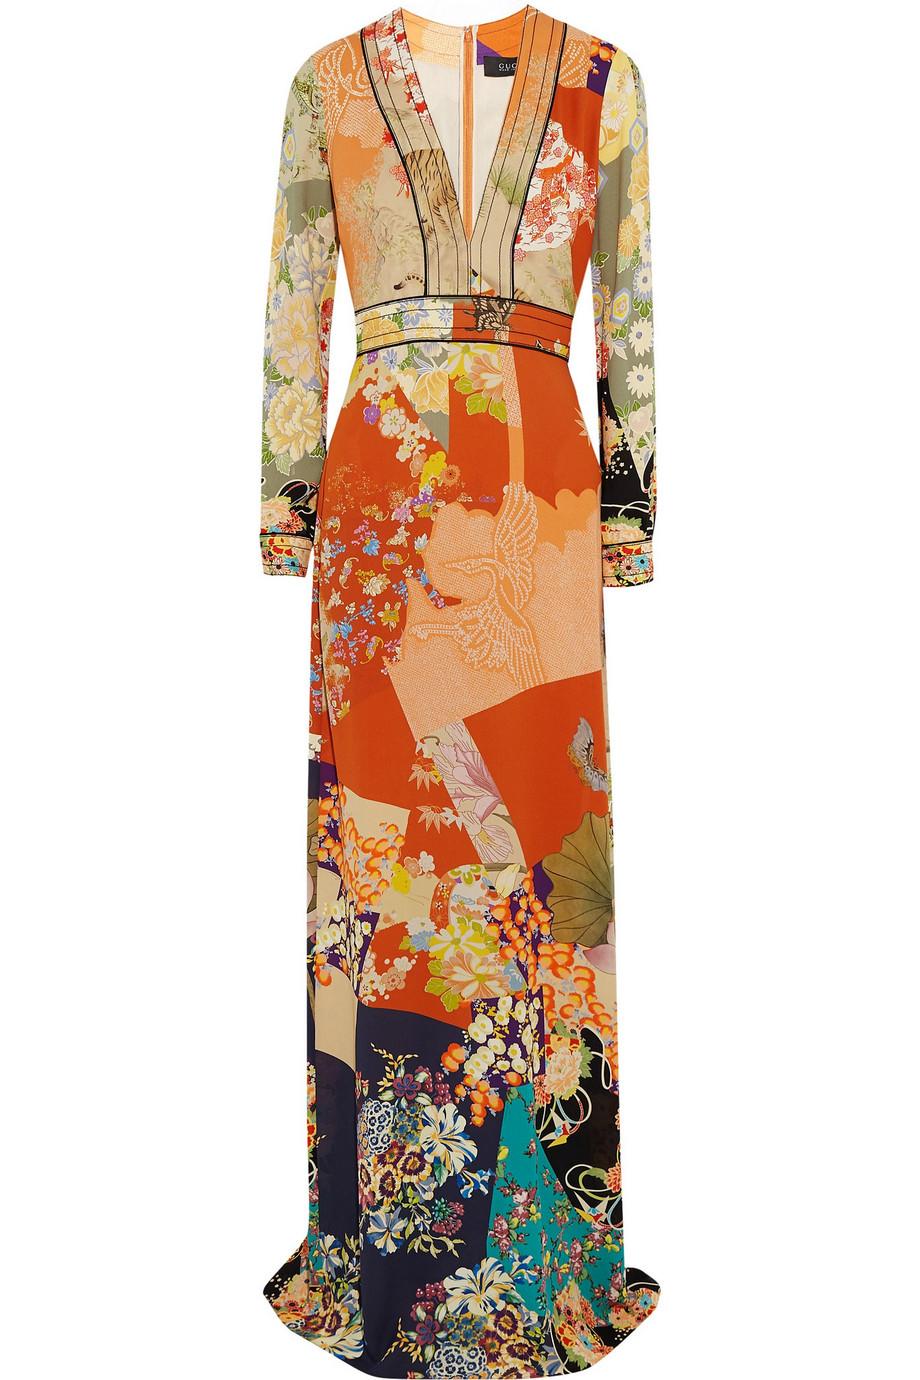 Gucci Printed Silk Crepe De Chine Gown, Size: 40